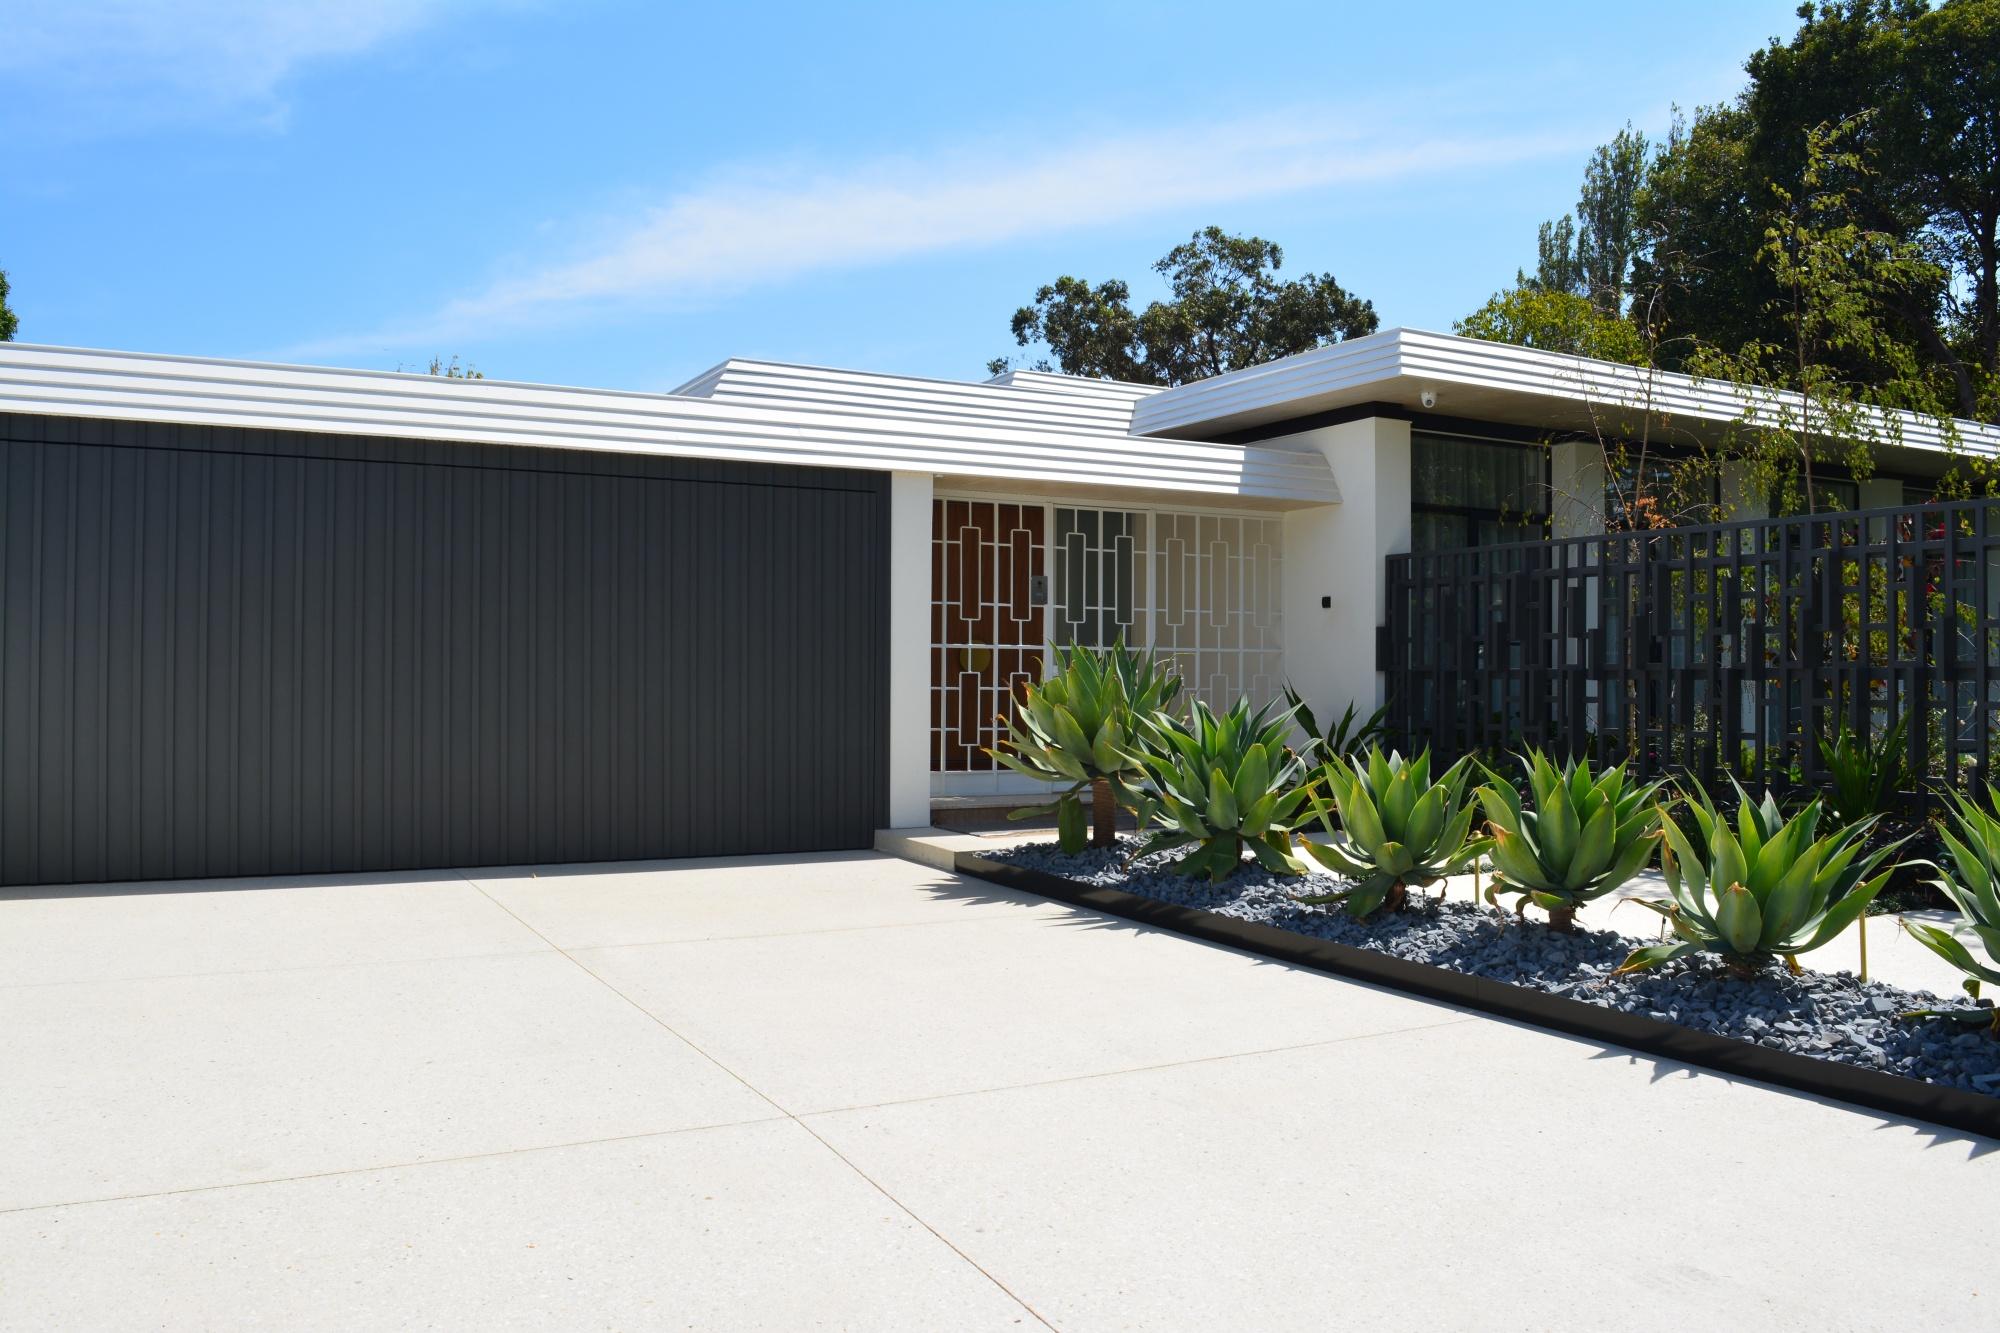 Mid Century Modern-Tecture-The Local Project-Australian Architecture & Design-Image 9